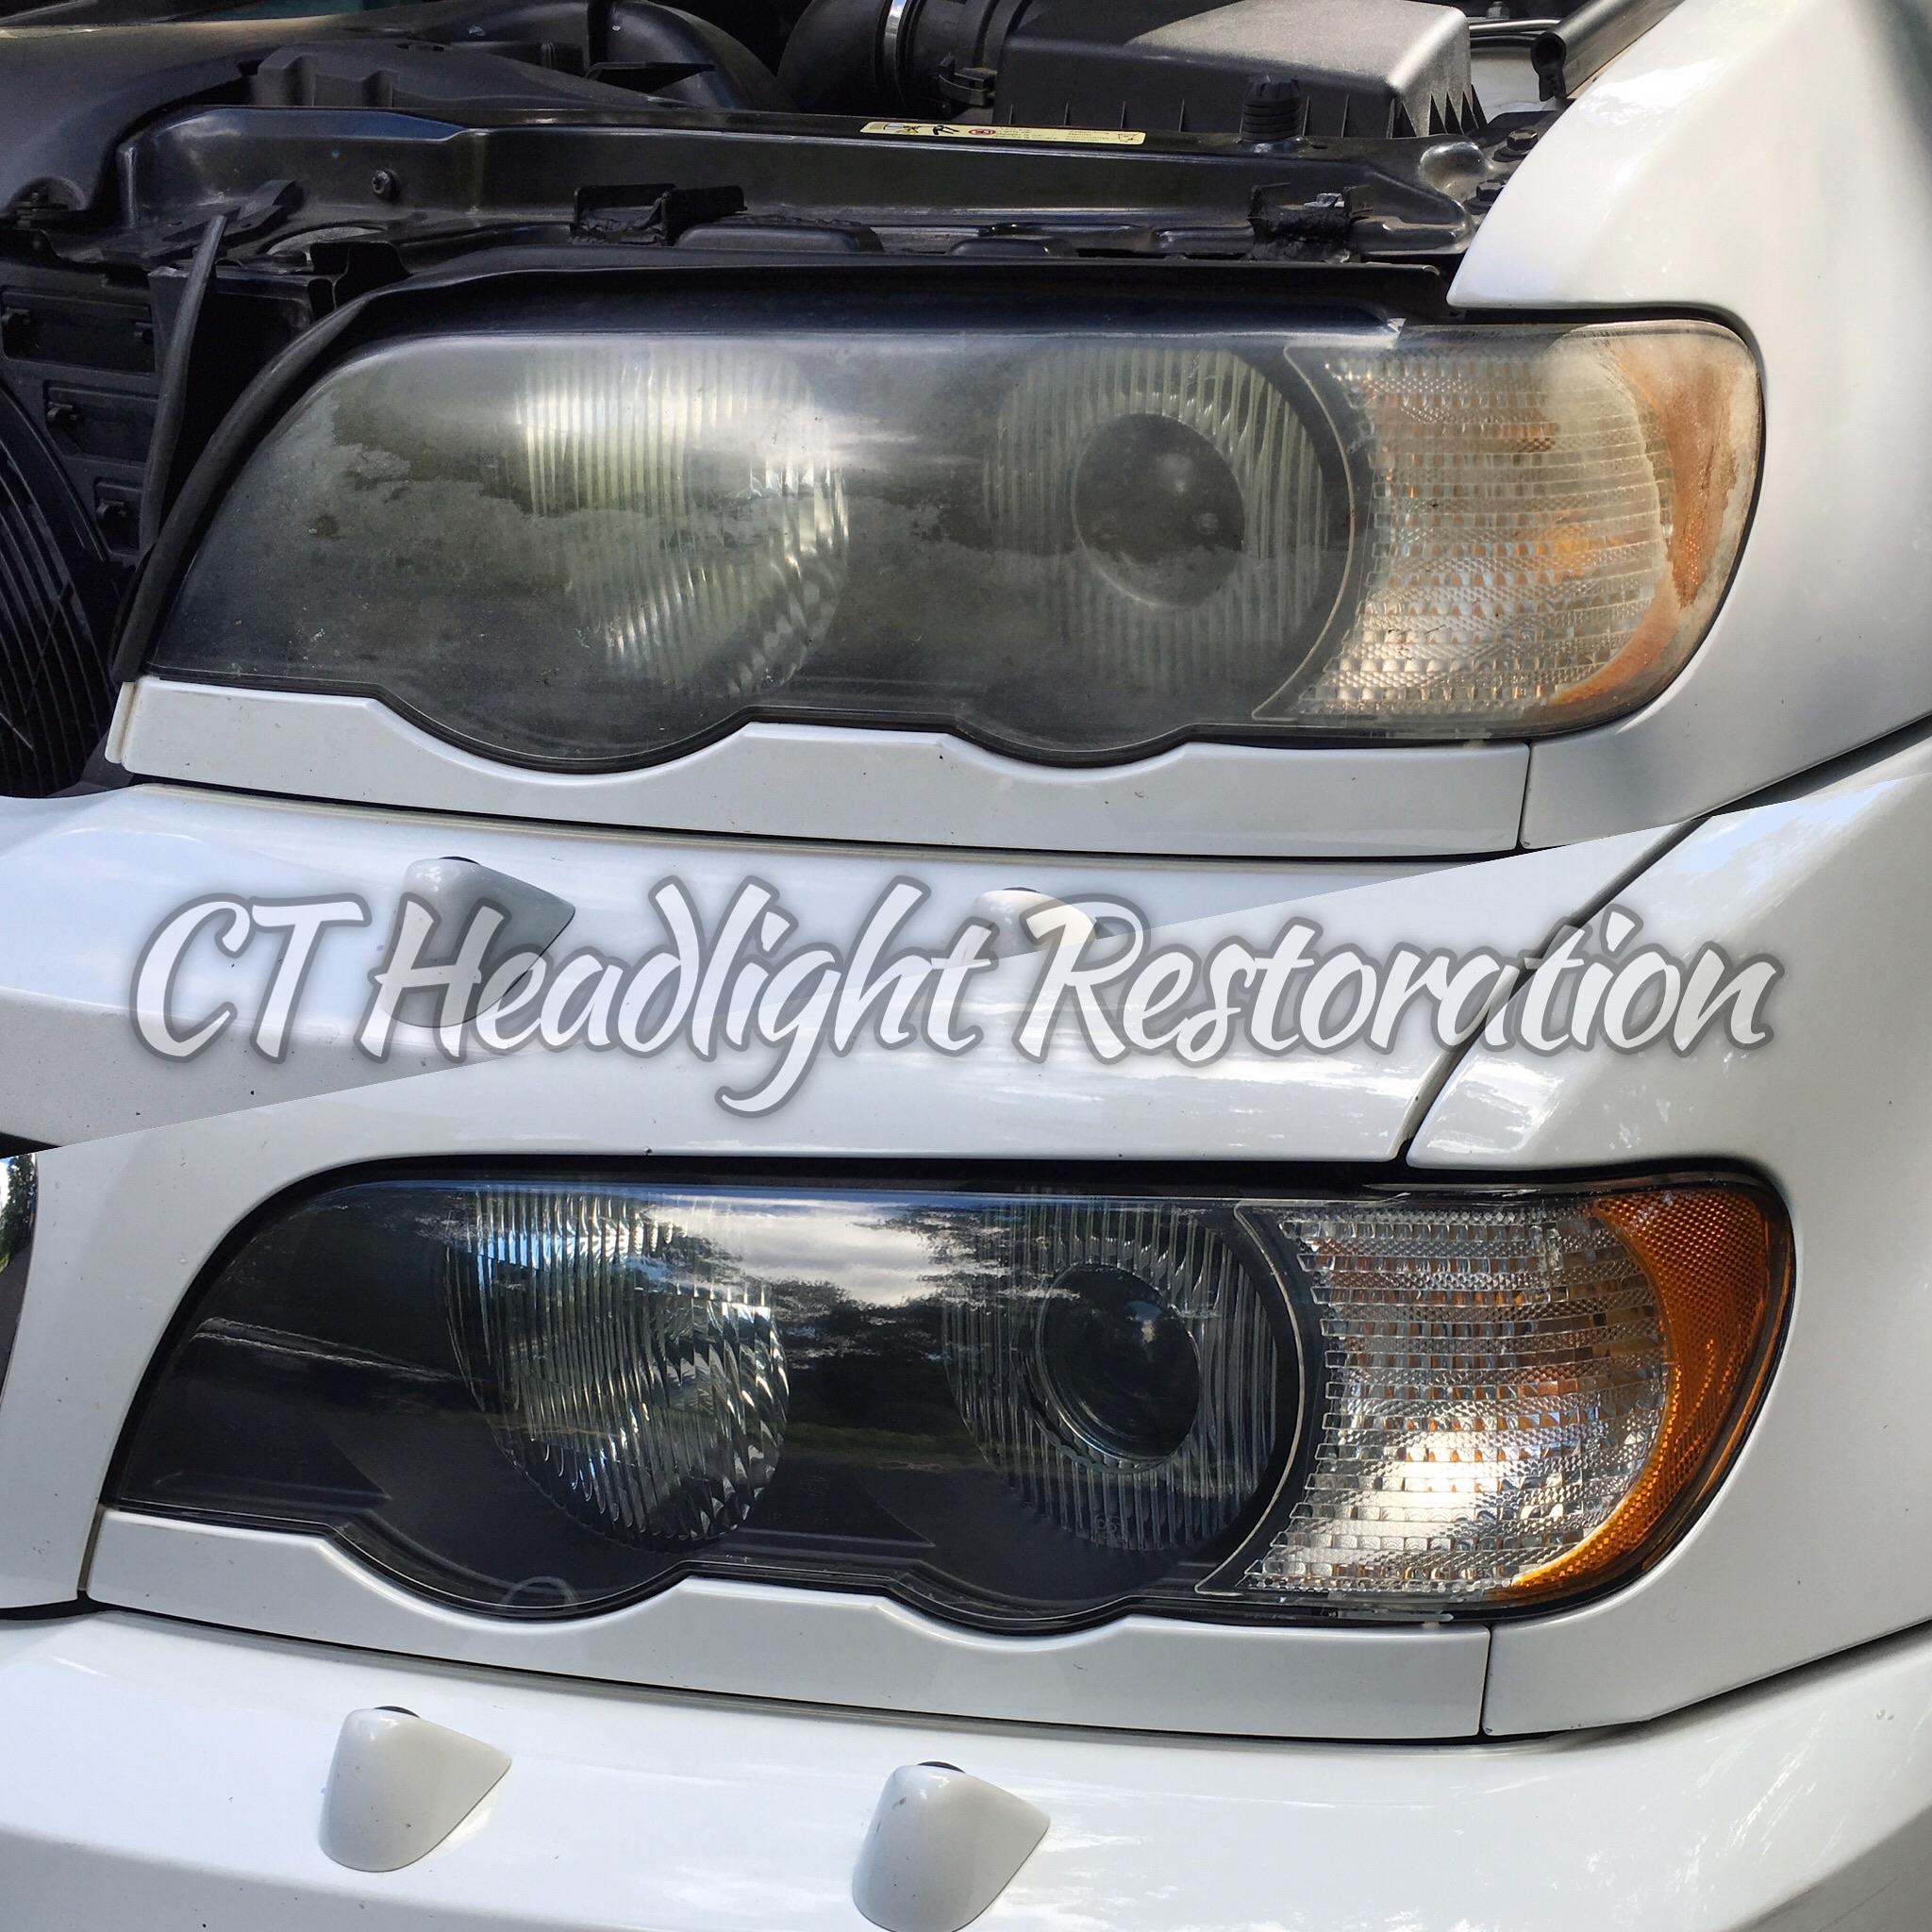 BMW X5 CT Headlight Restoration Connecticut.jpg